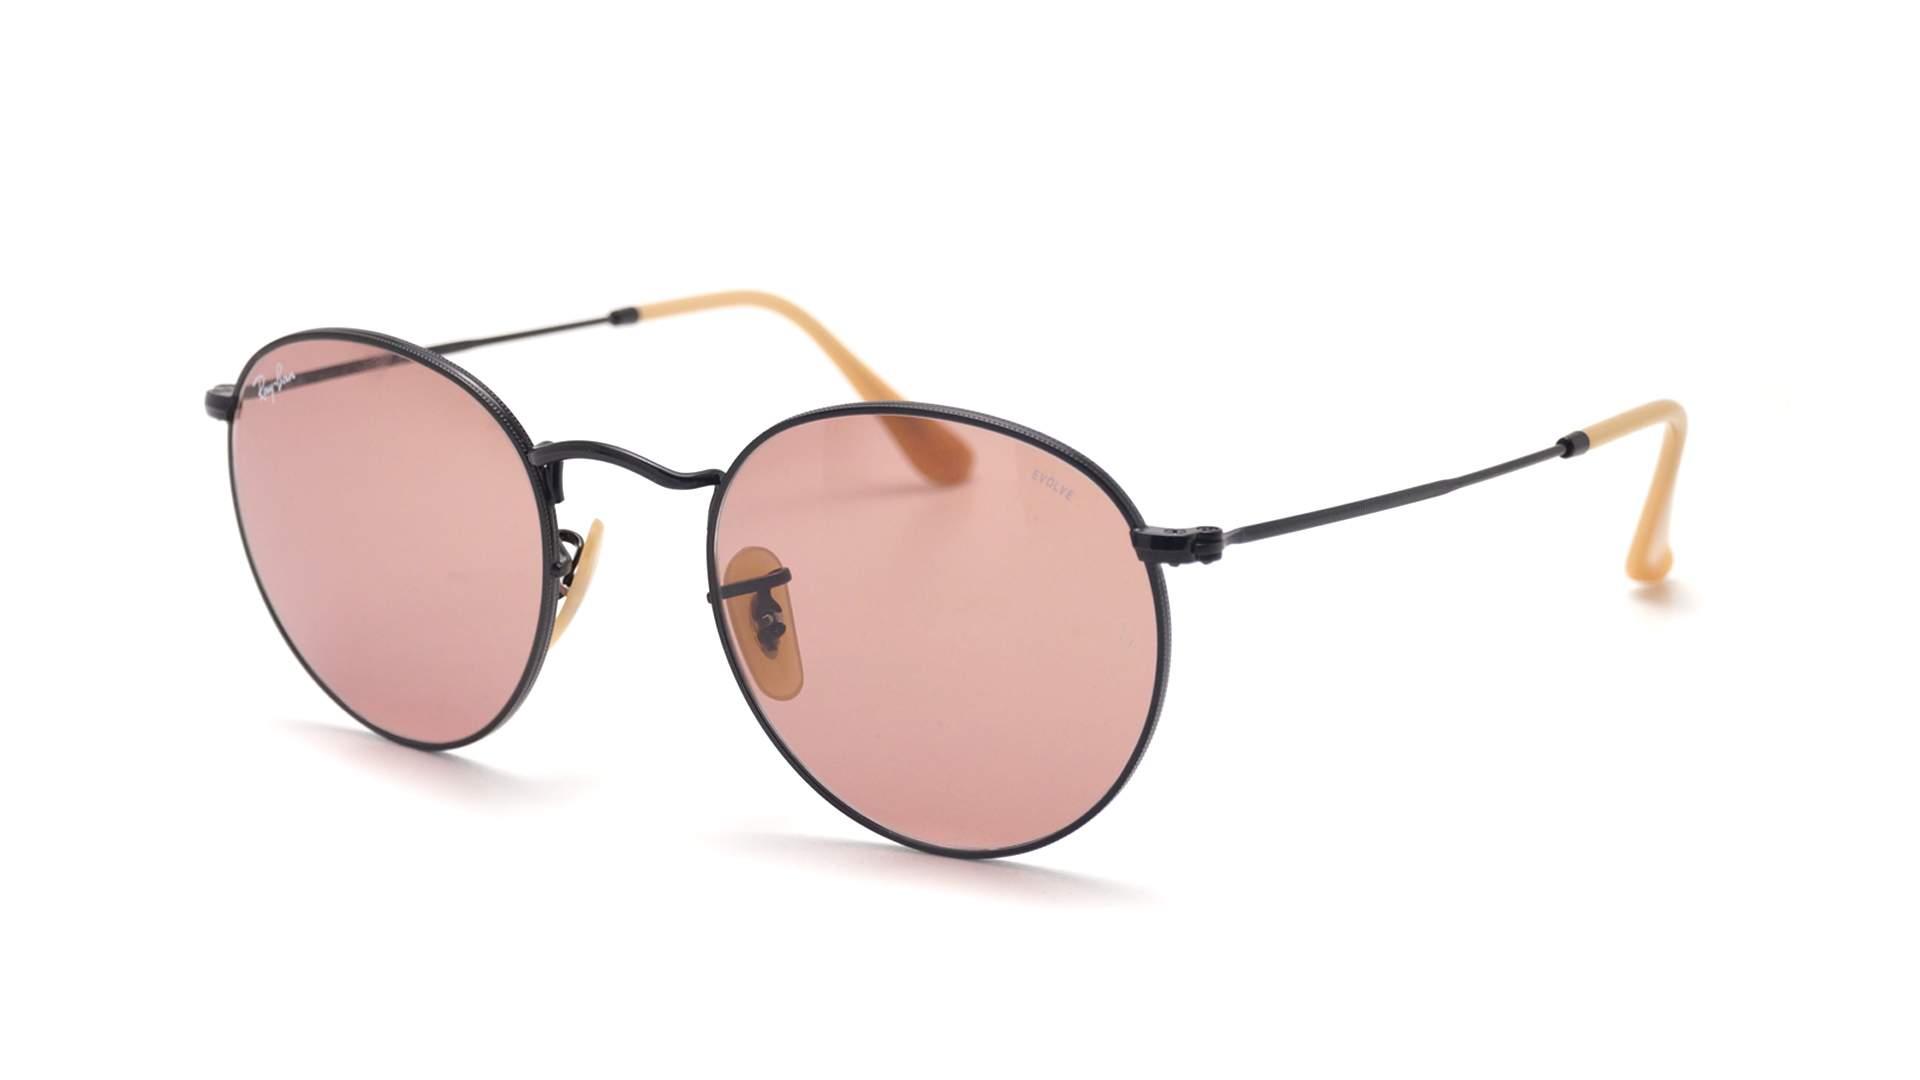 899b61c824 Sunglasses Ray-Ban Round Evolve Black RB3447 9066 Z0 50-21 Medium  Photochromic